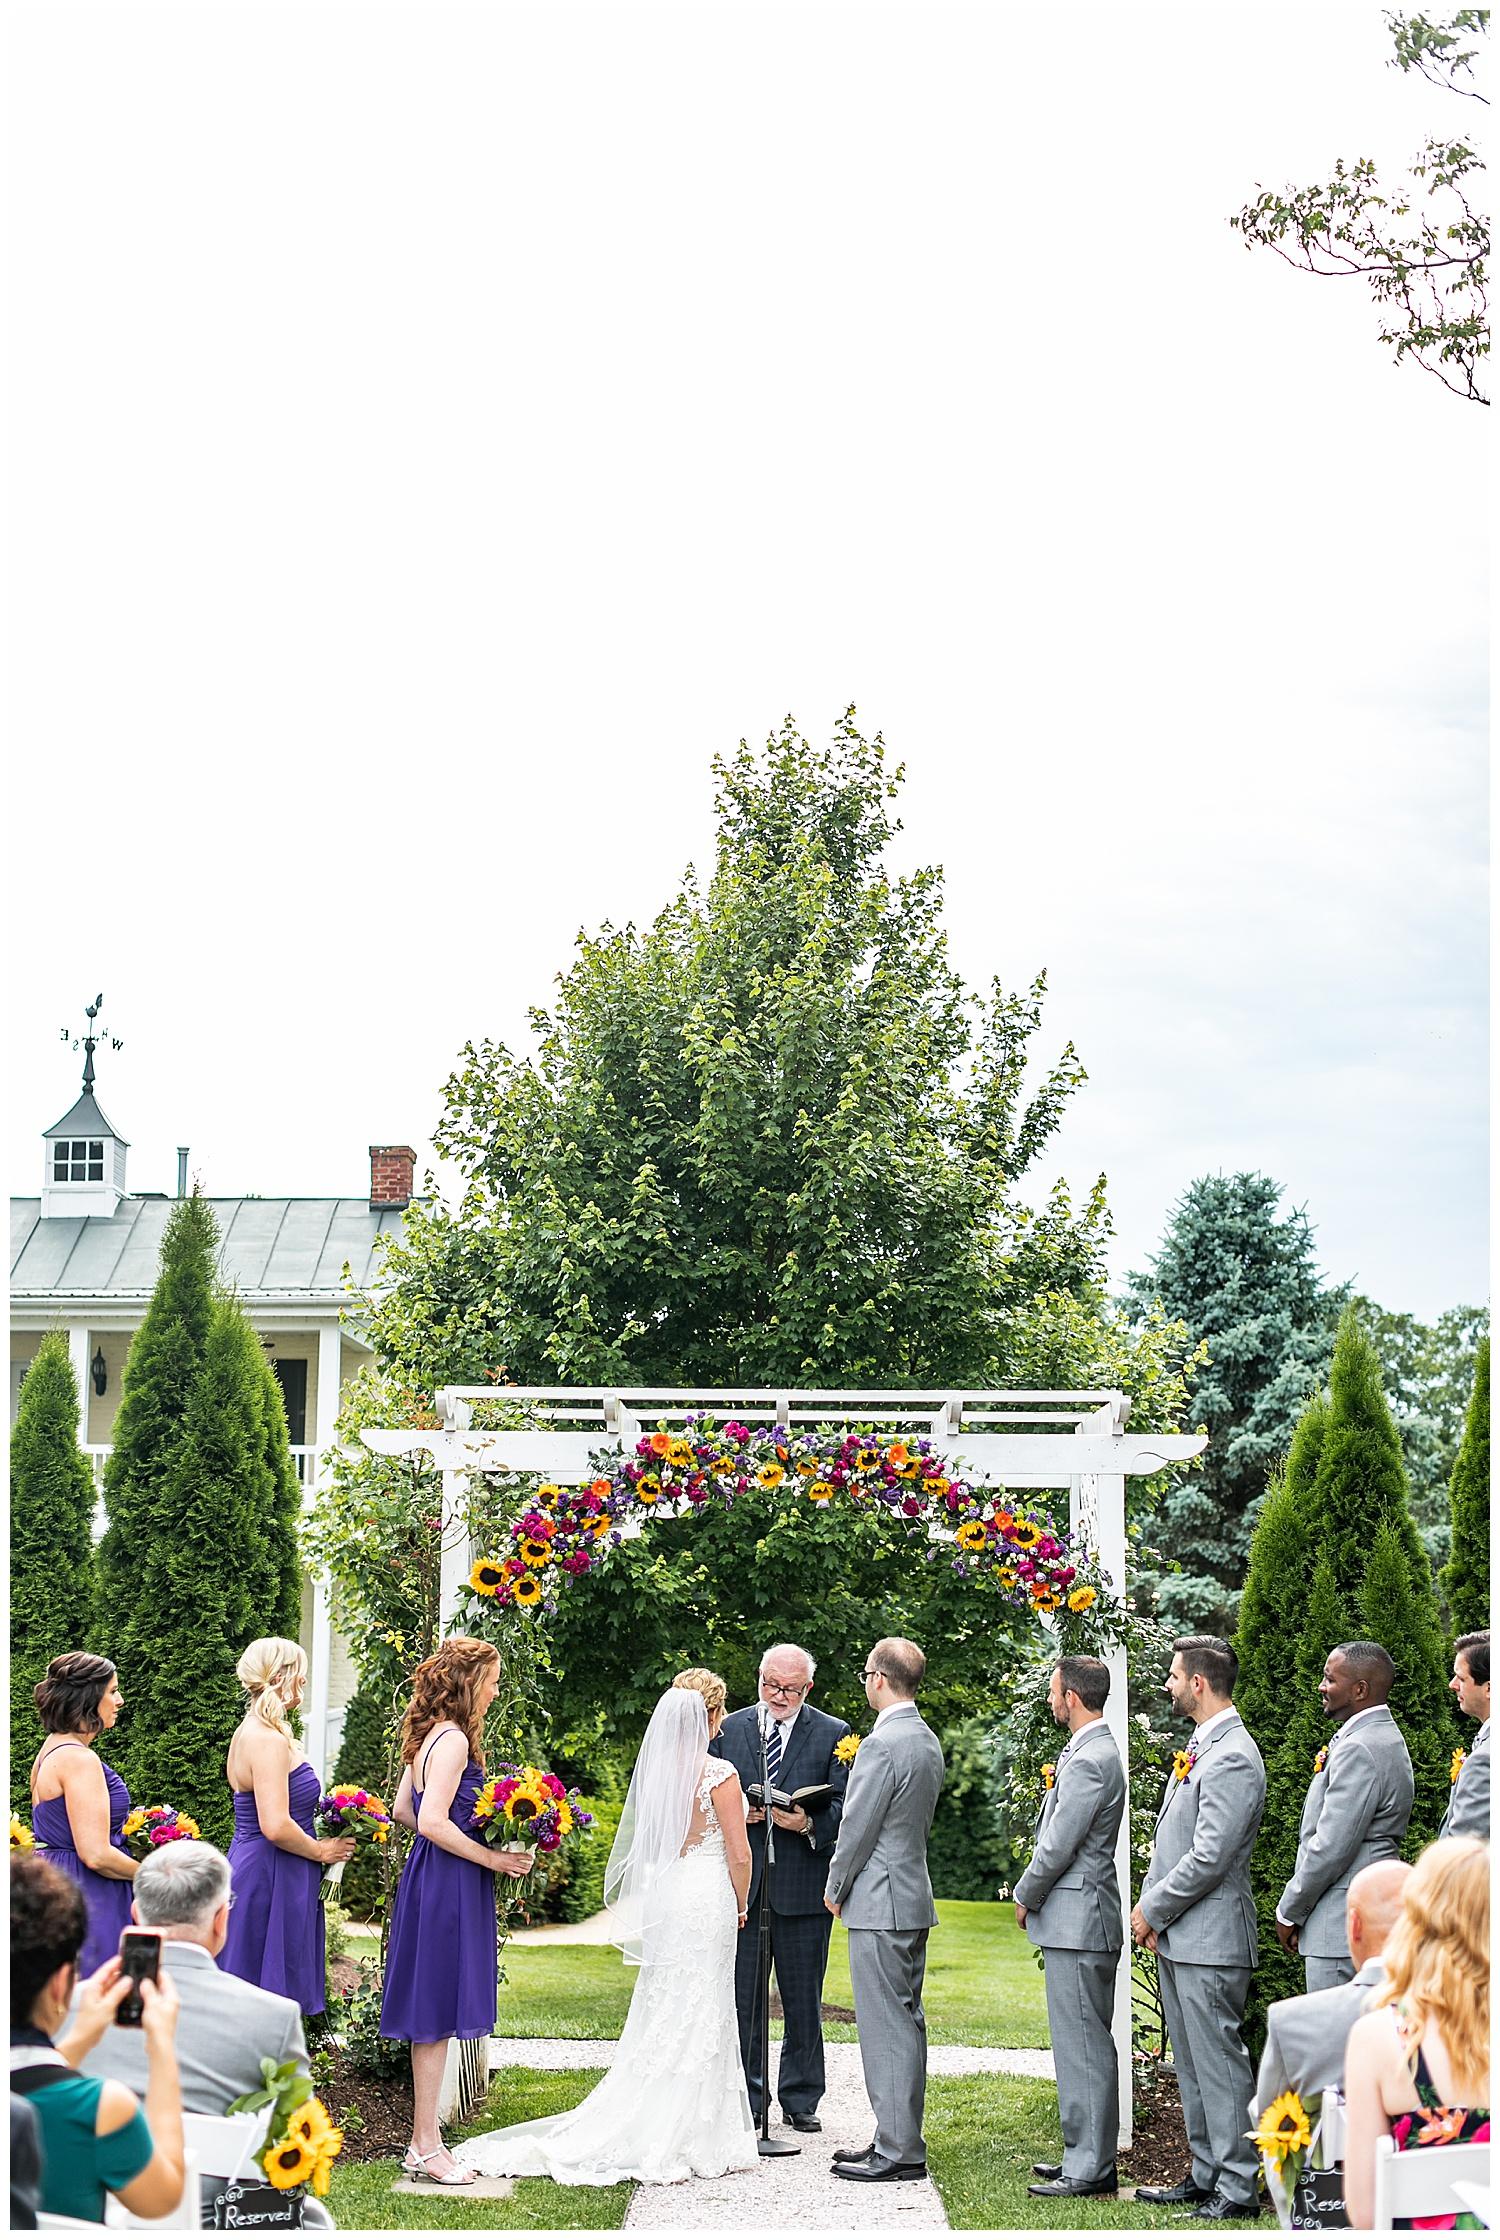 Michelle Shaun Antrim 1844 Wedding Living Radiant Photography photos_0109.jpg